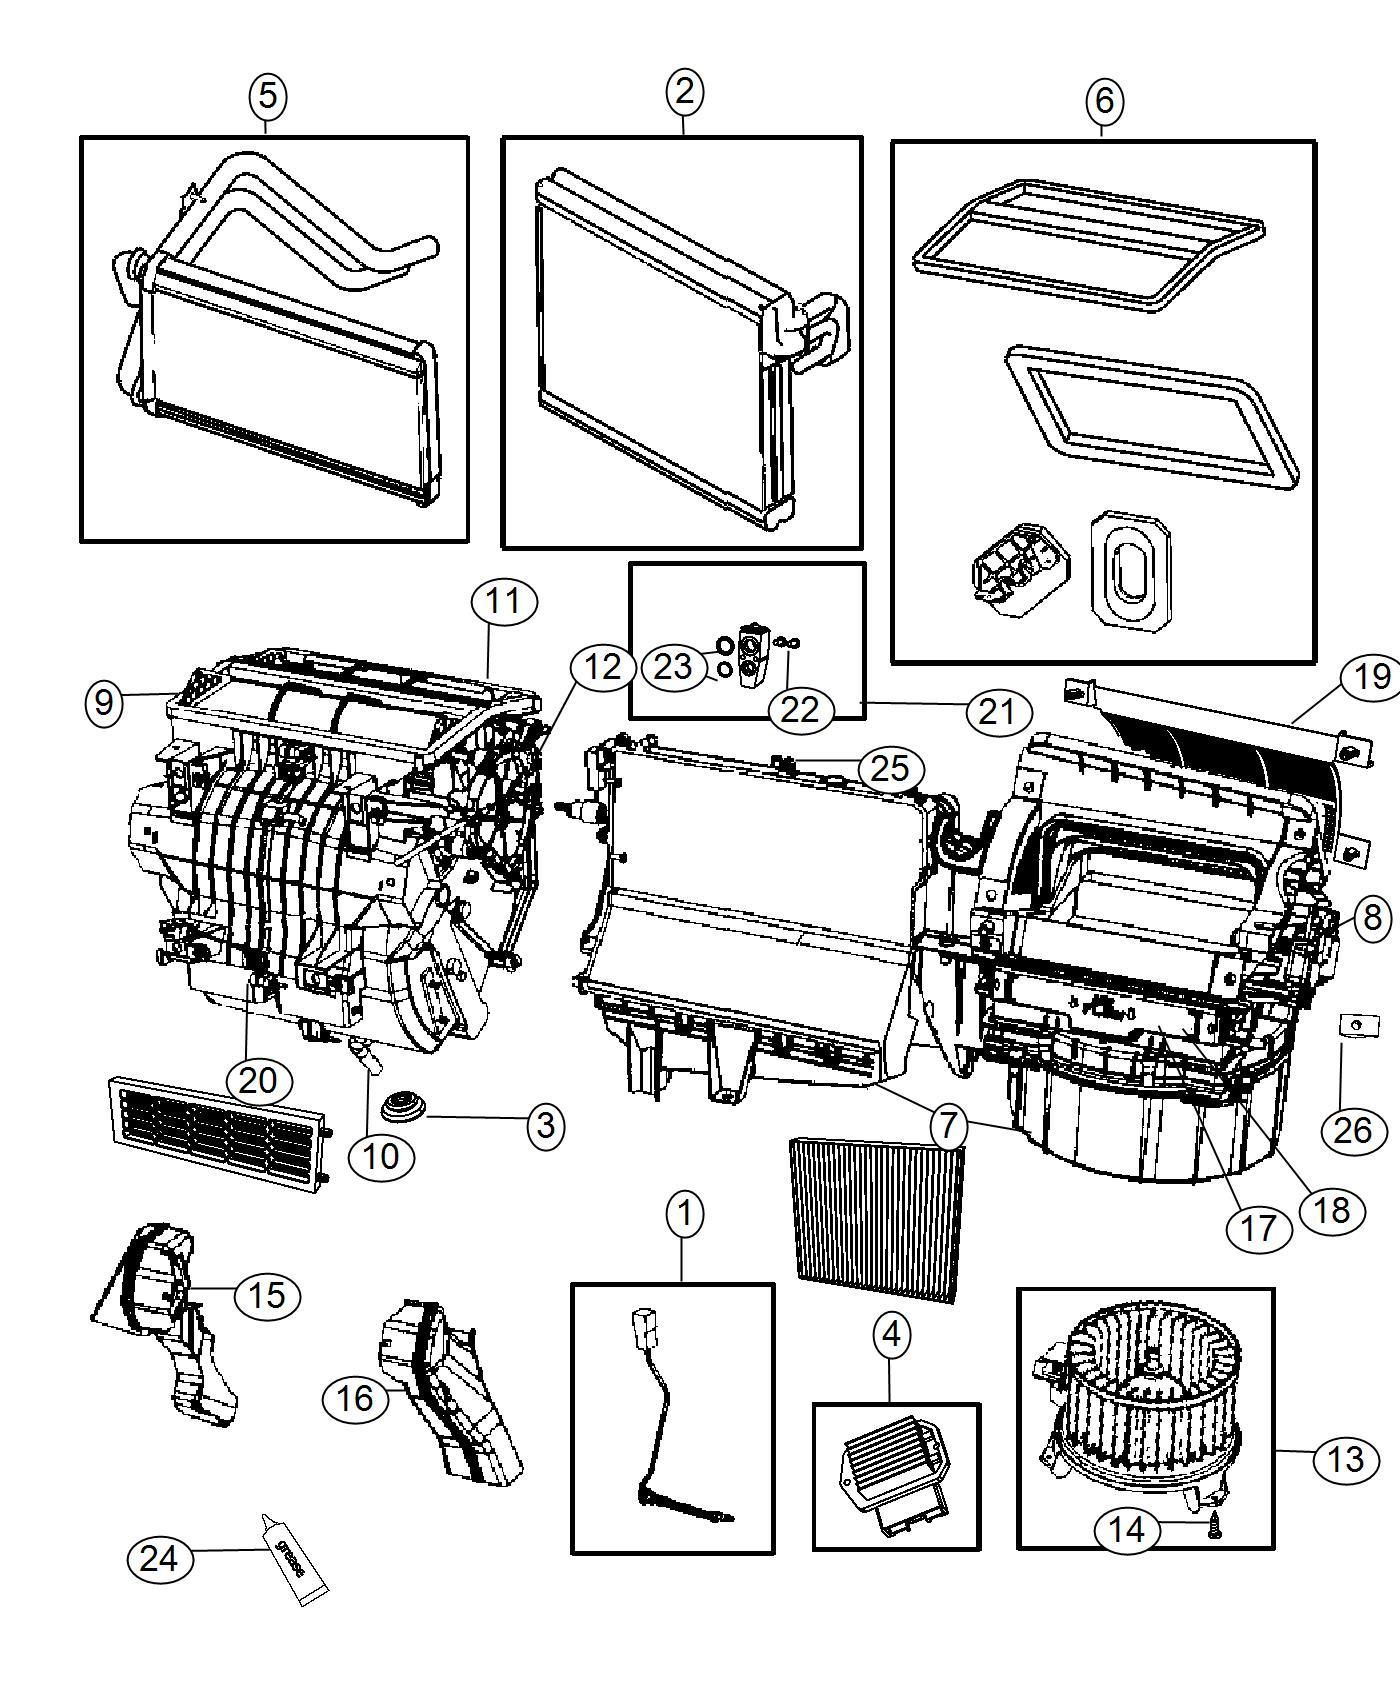 Jeep Patriot Evaporator Air Conditioning Heater